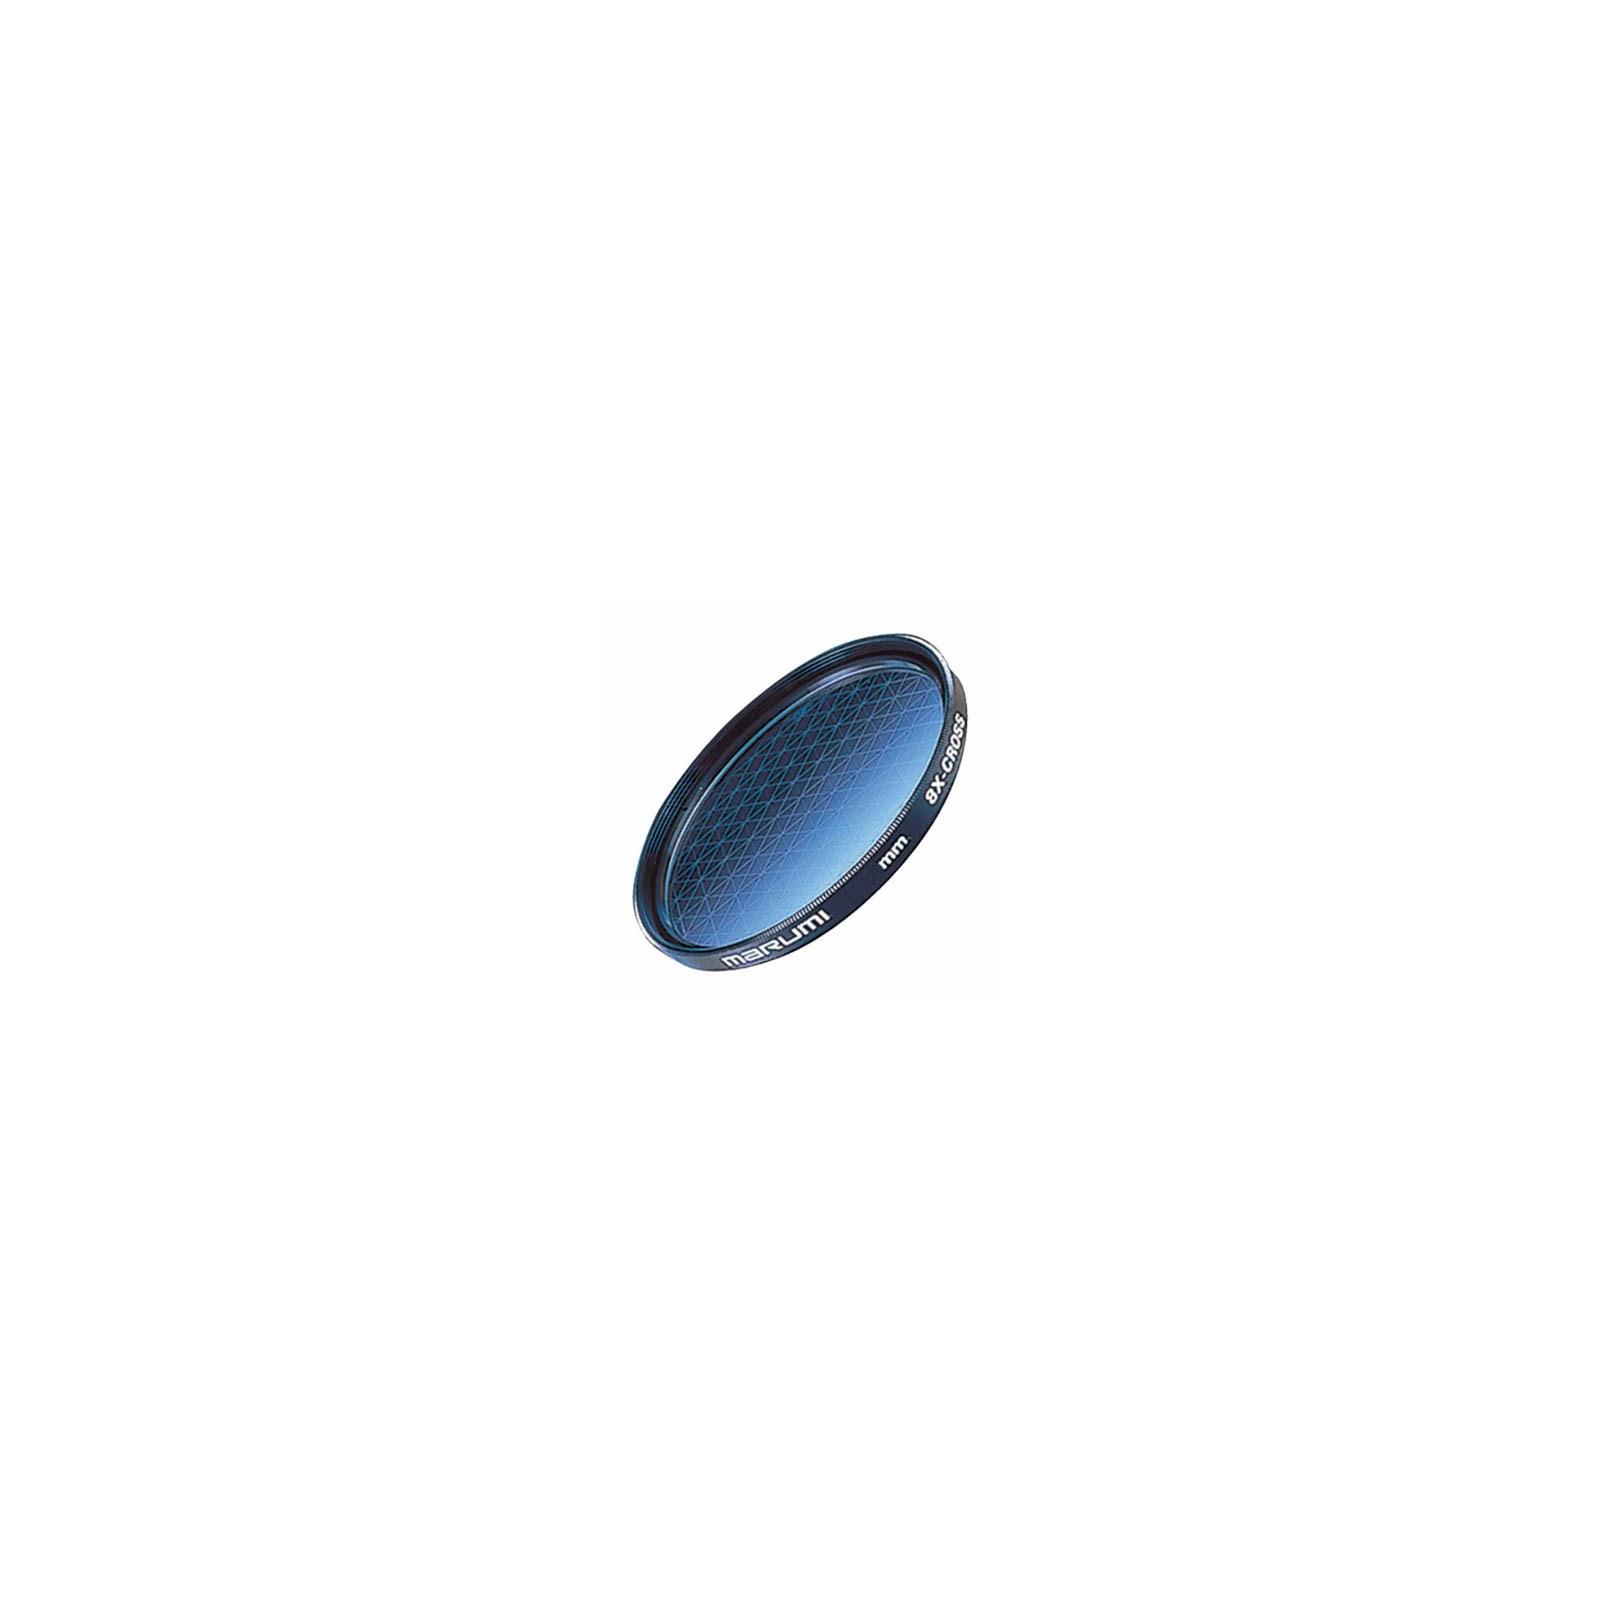 Светофильтр Marumi 8X-Cross 77mm